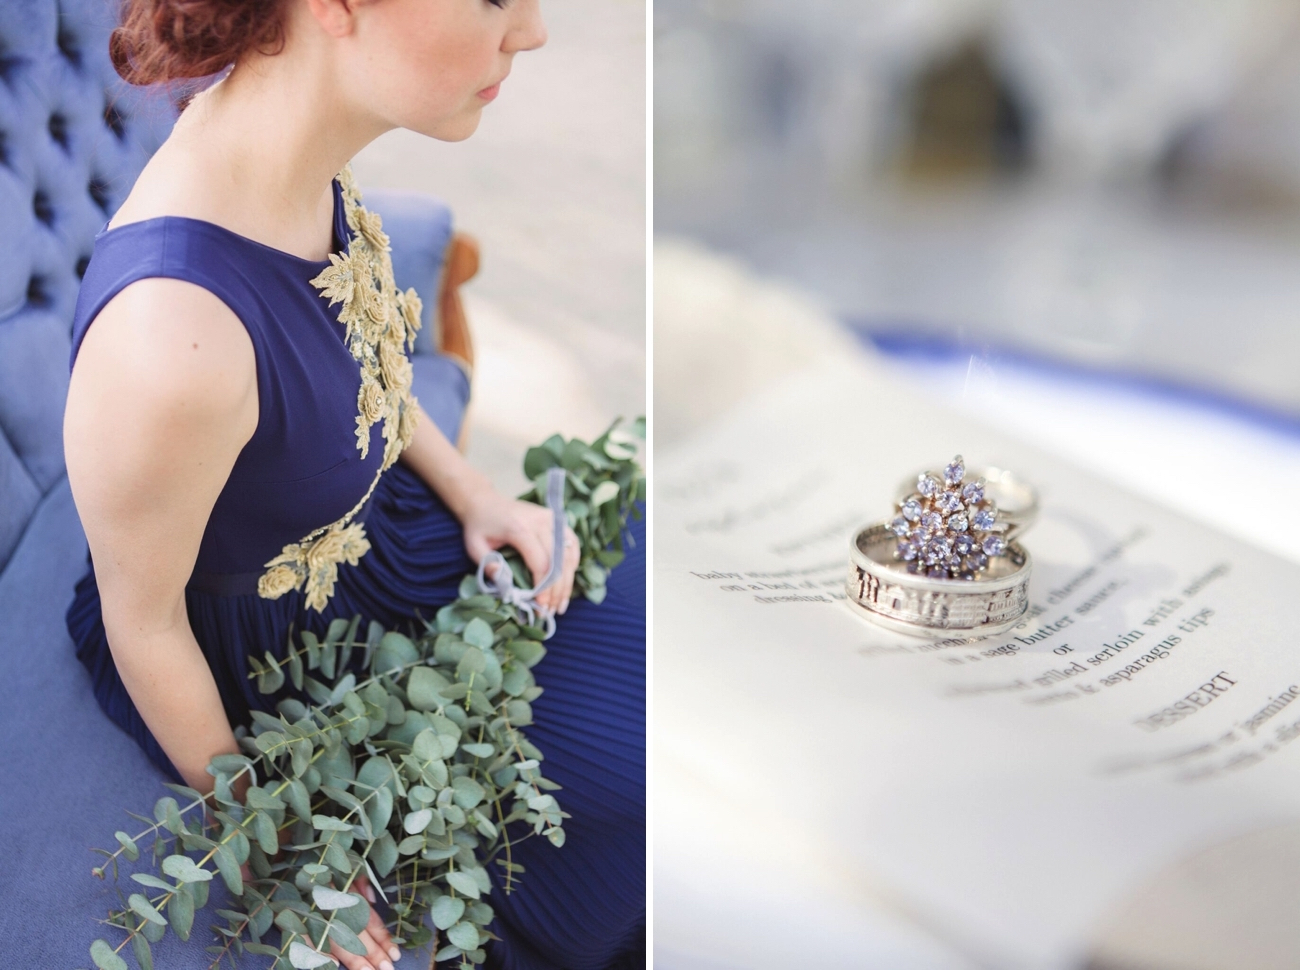 Indigo & Grey Rustic Wedding Inspiration   Credit: Dust & Dreams Photography